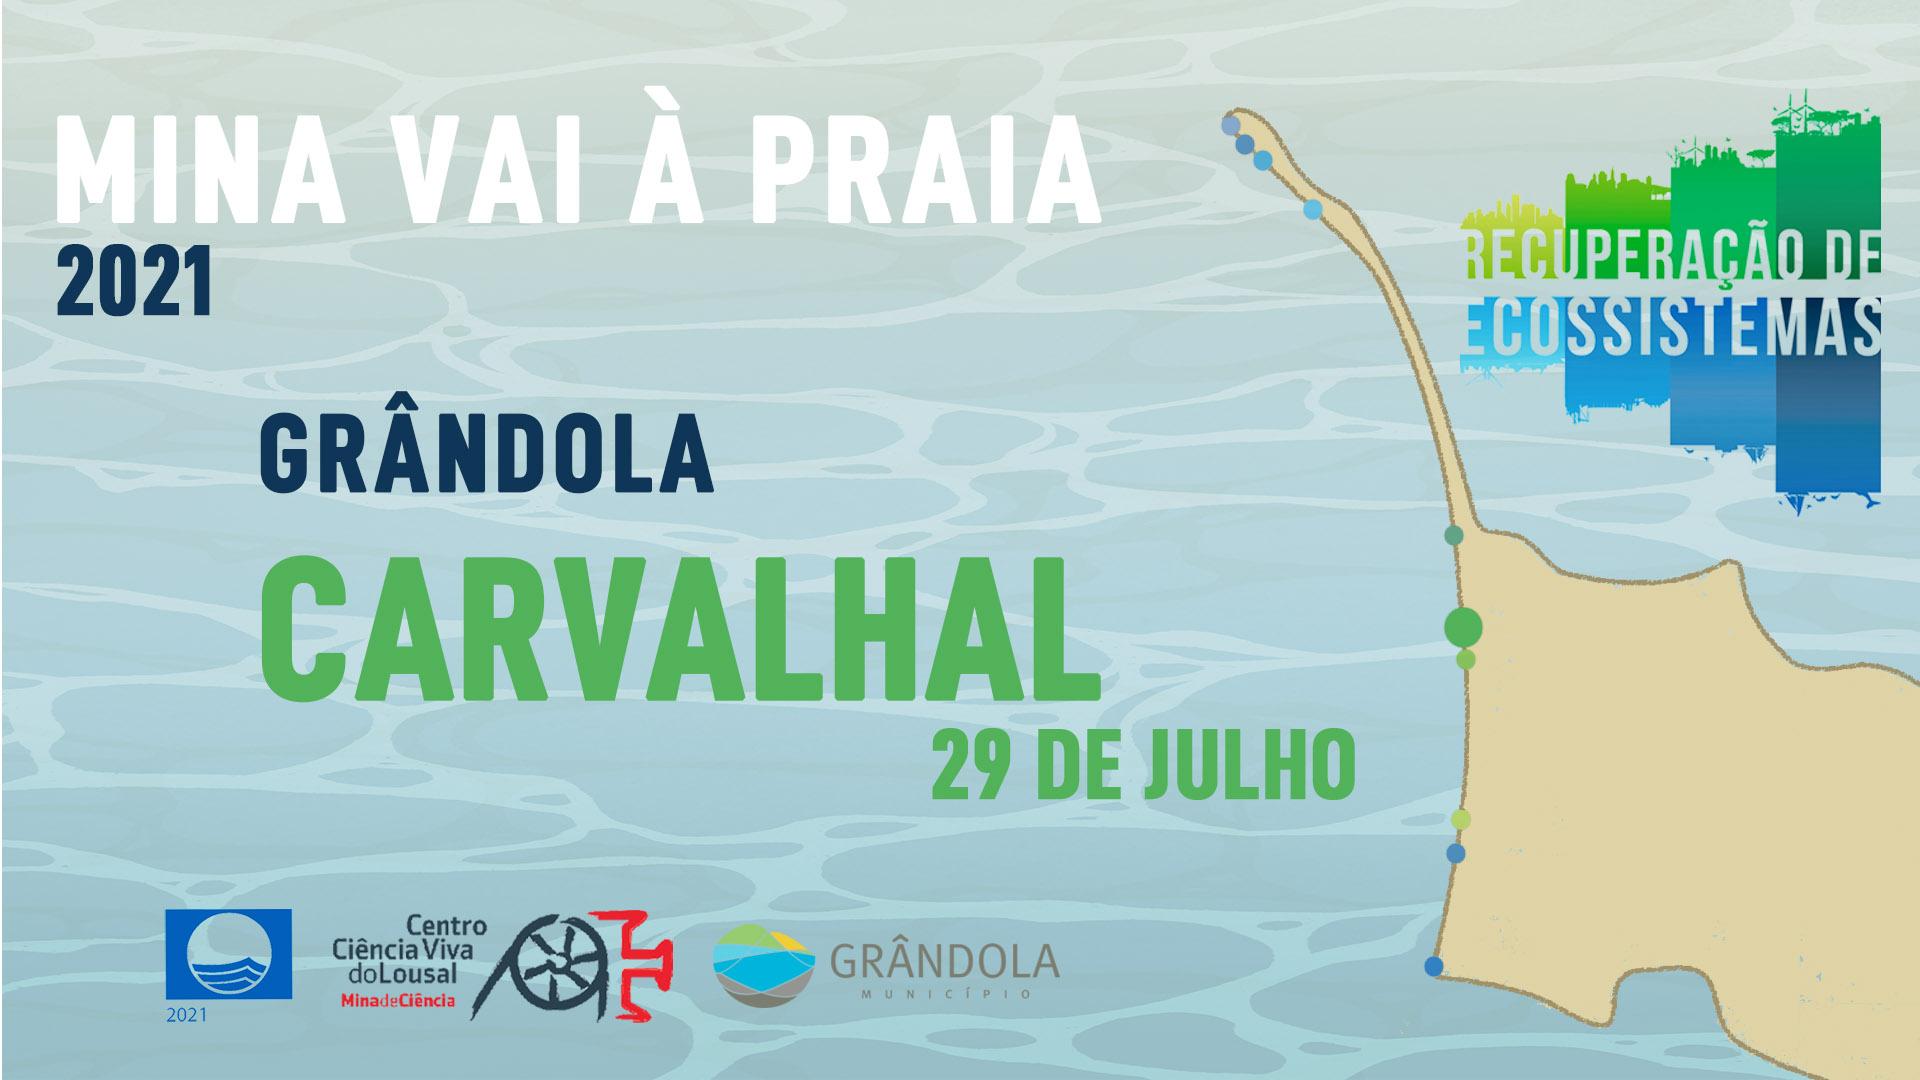 Mina vai à Praia - Carvalhal